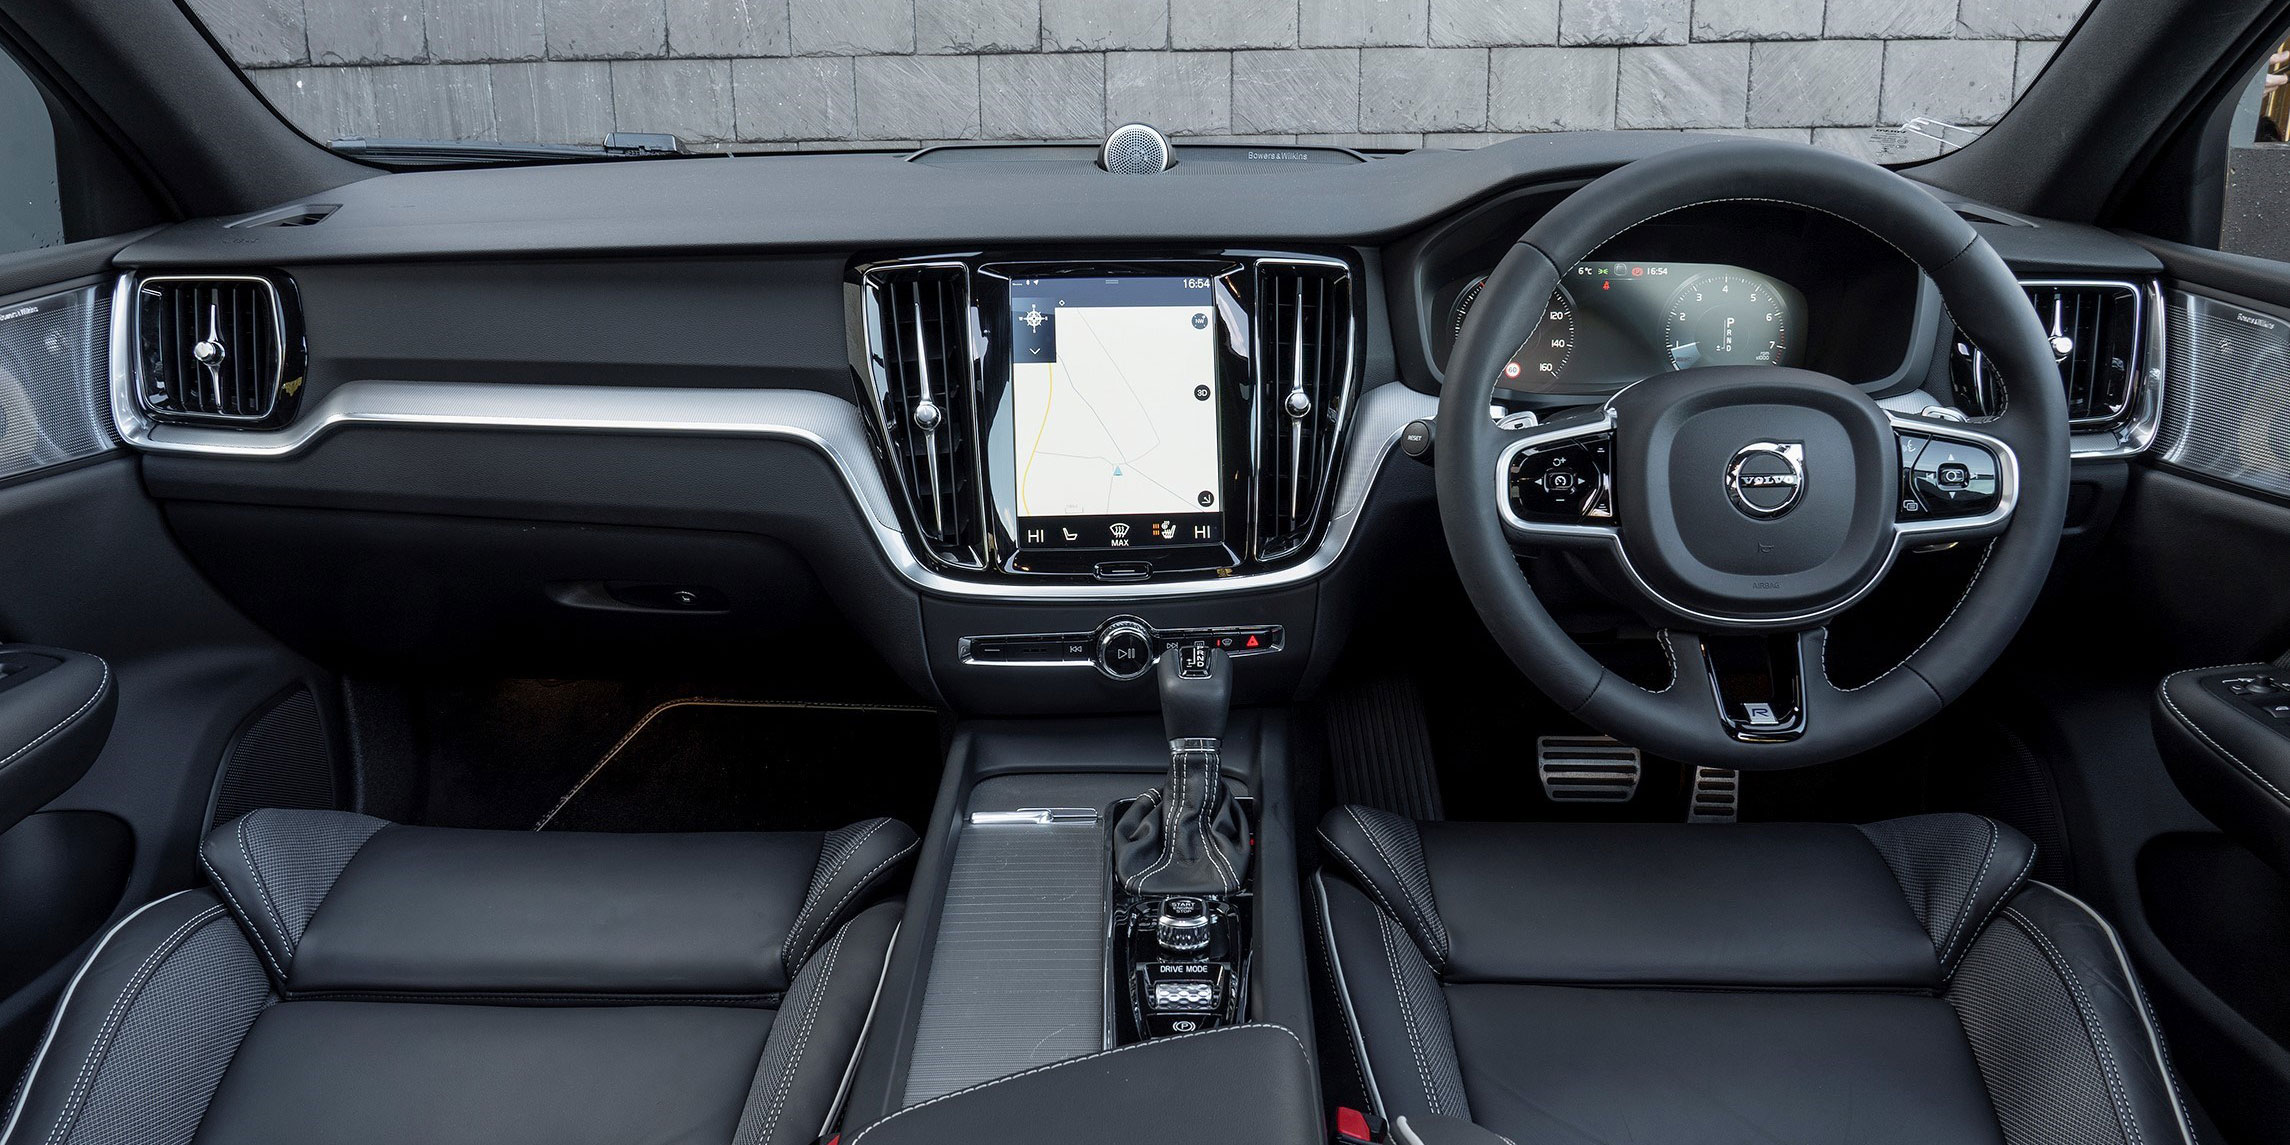 Volvo S60 Interior Infotainment Carwow